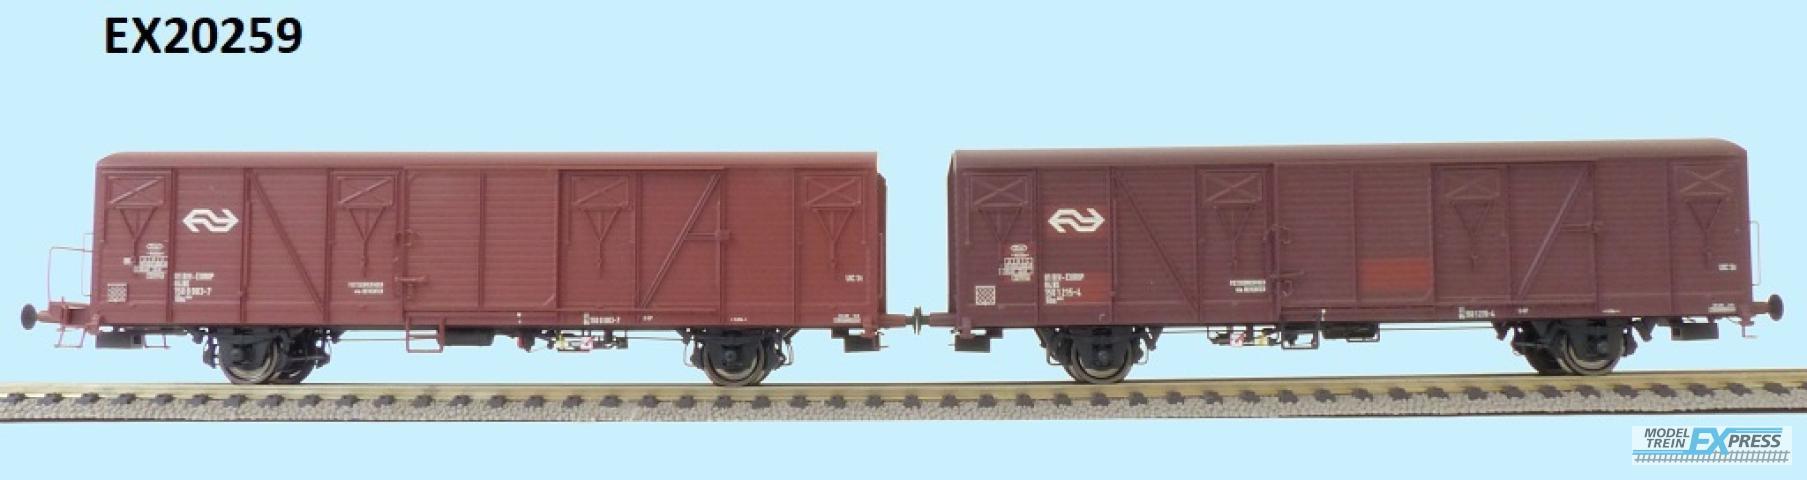 Exact-train 20259